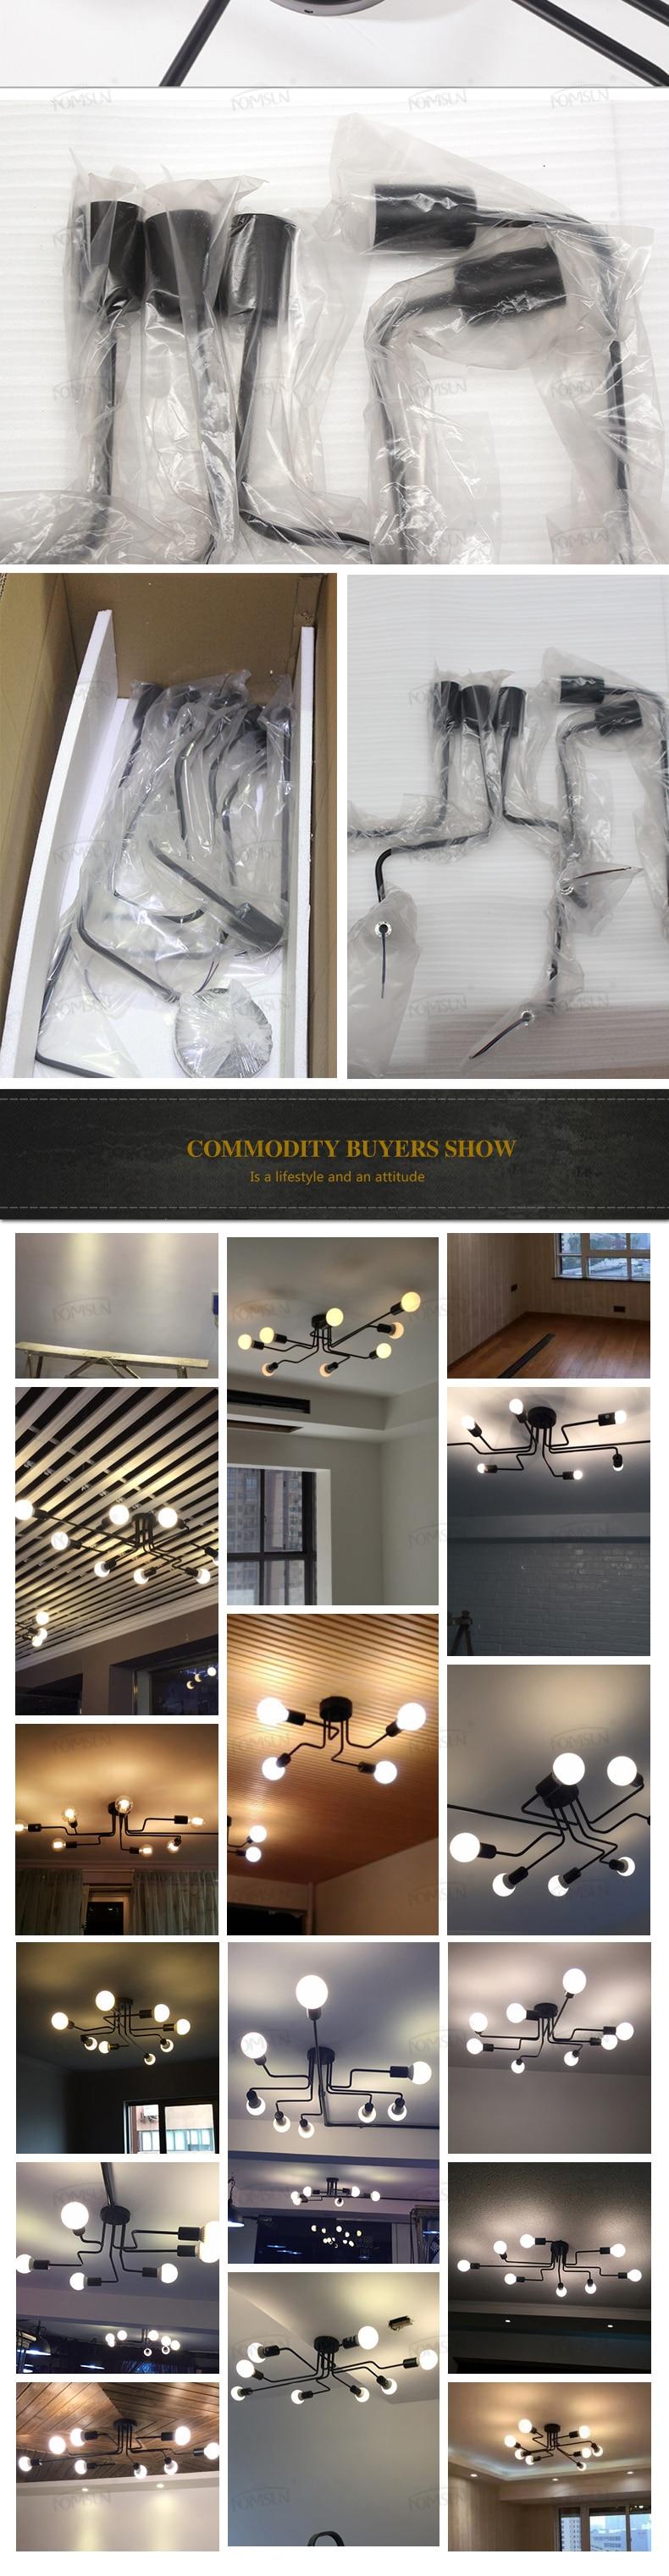 HTB1oByaXdbJ8KJjy1zjq6yqapXaC modern Ceiling Lights industrial lamps luminaria de teto e27 for Living Room bedroom vintage Ceiling lamp Home Lighting Fixtures